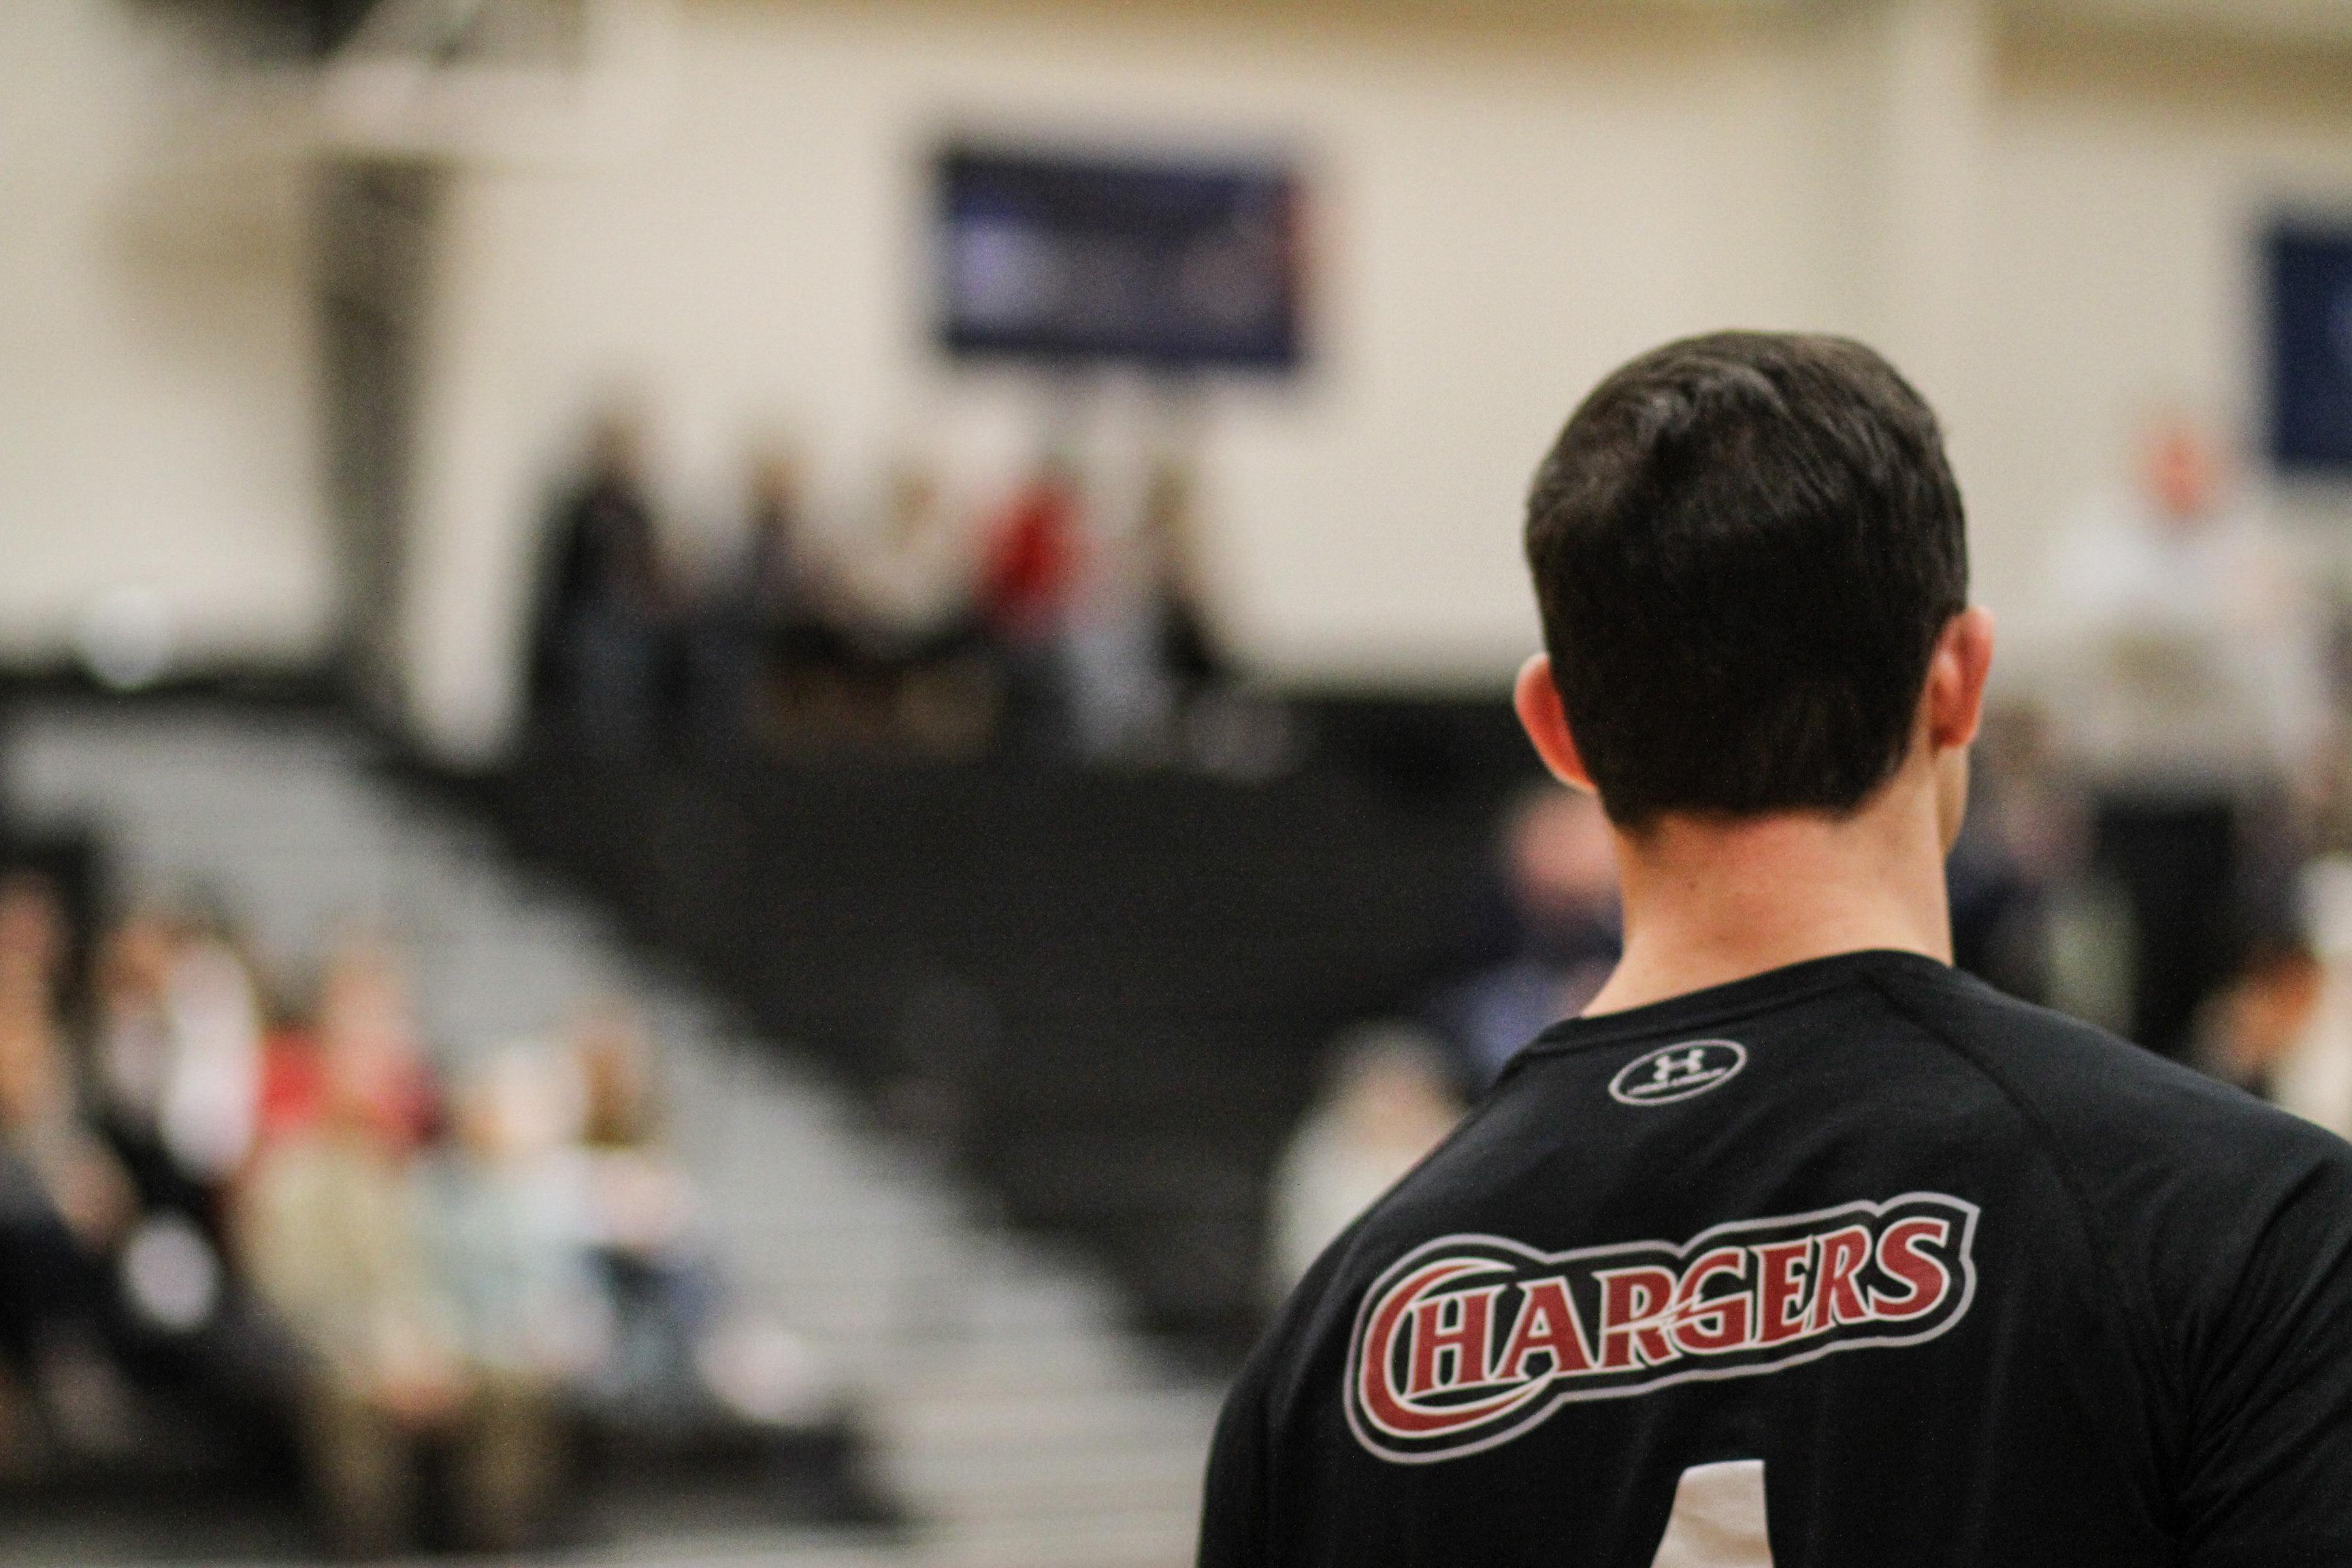 LBC student athlete.